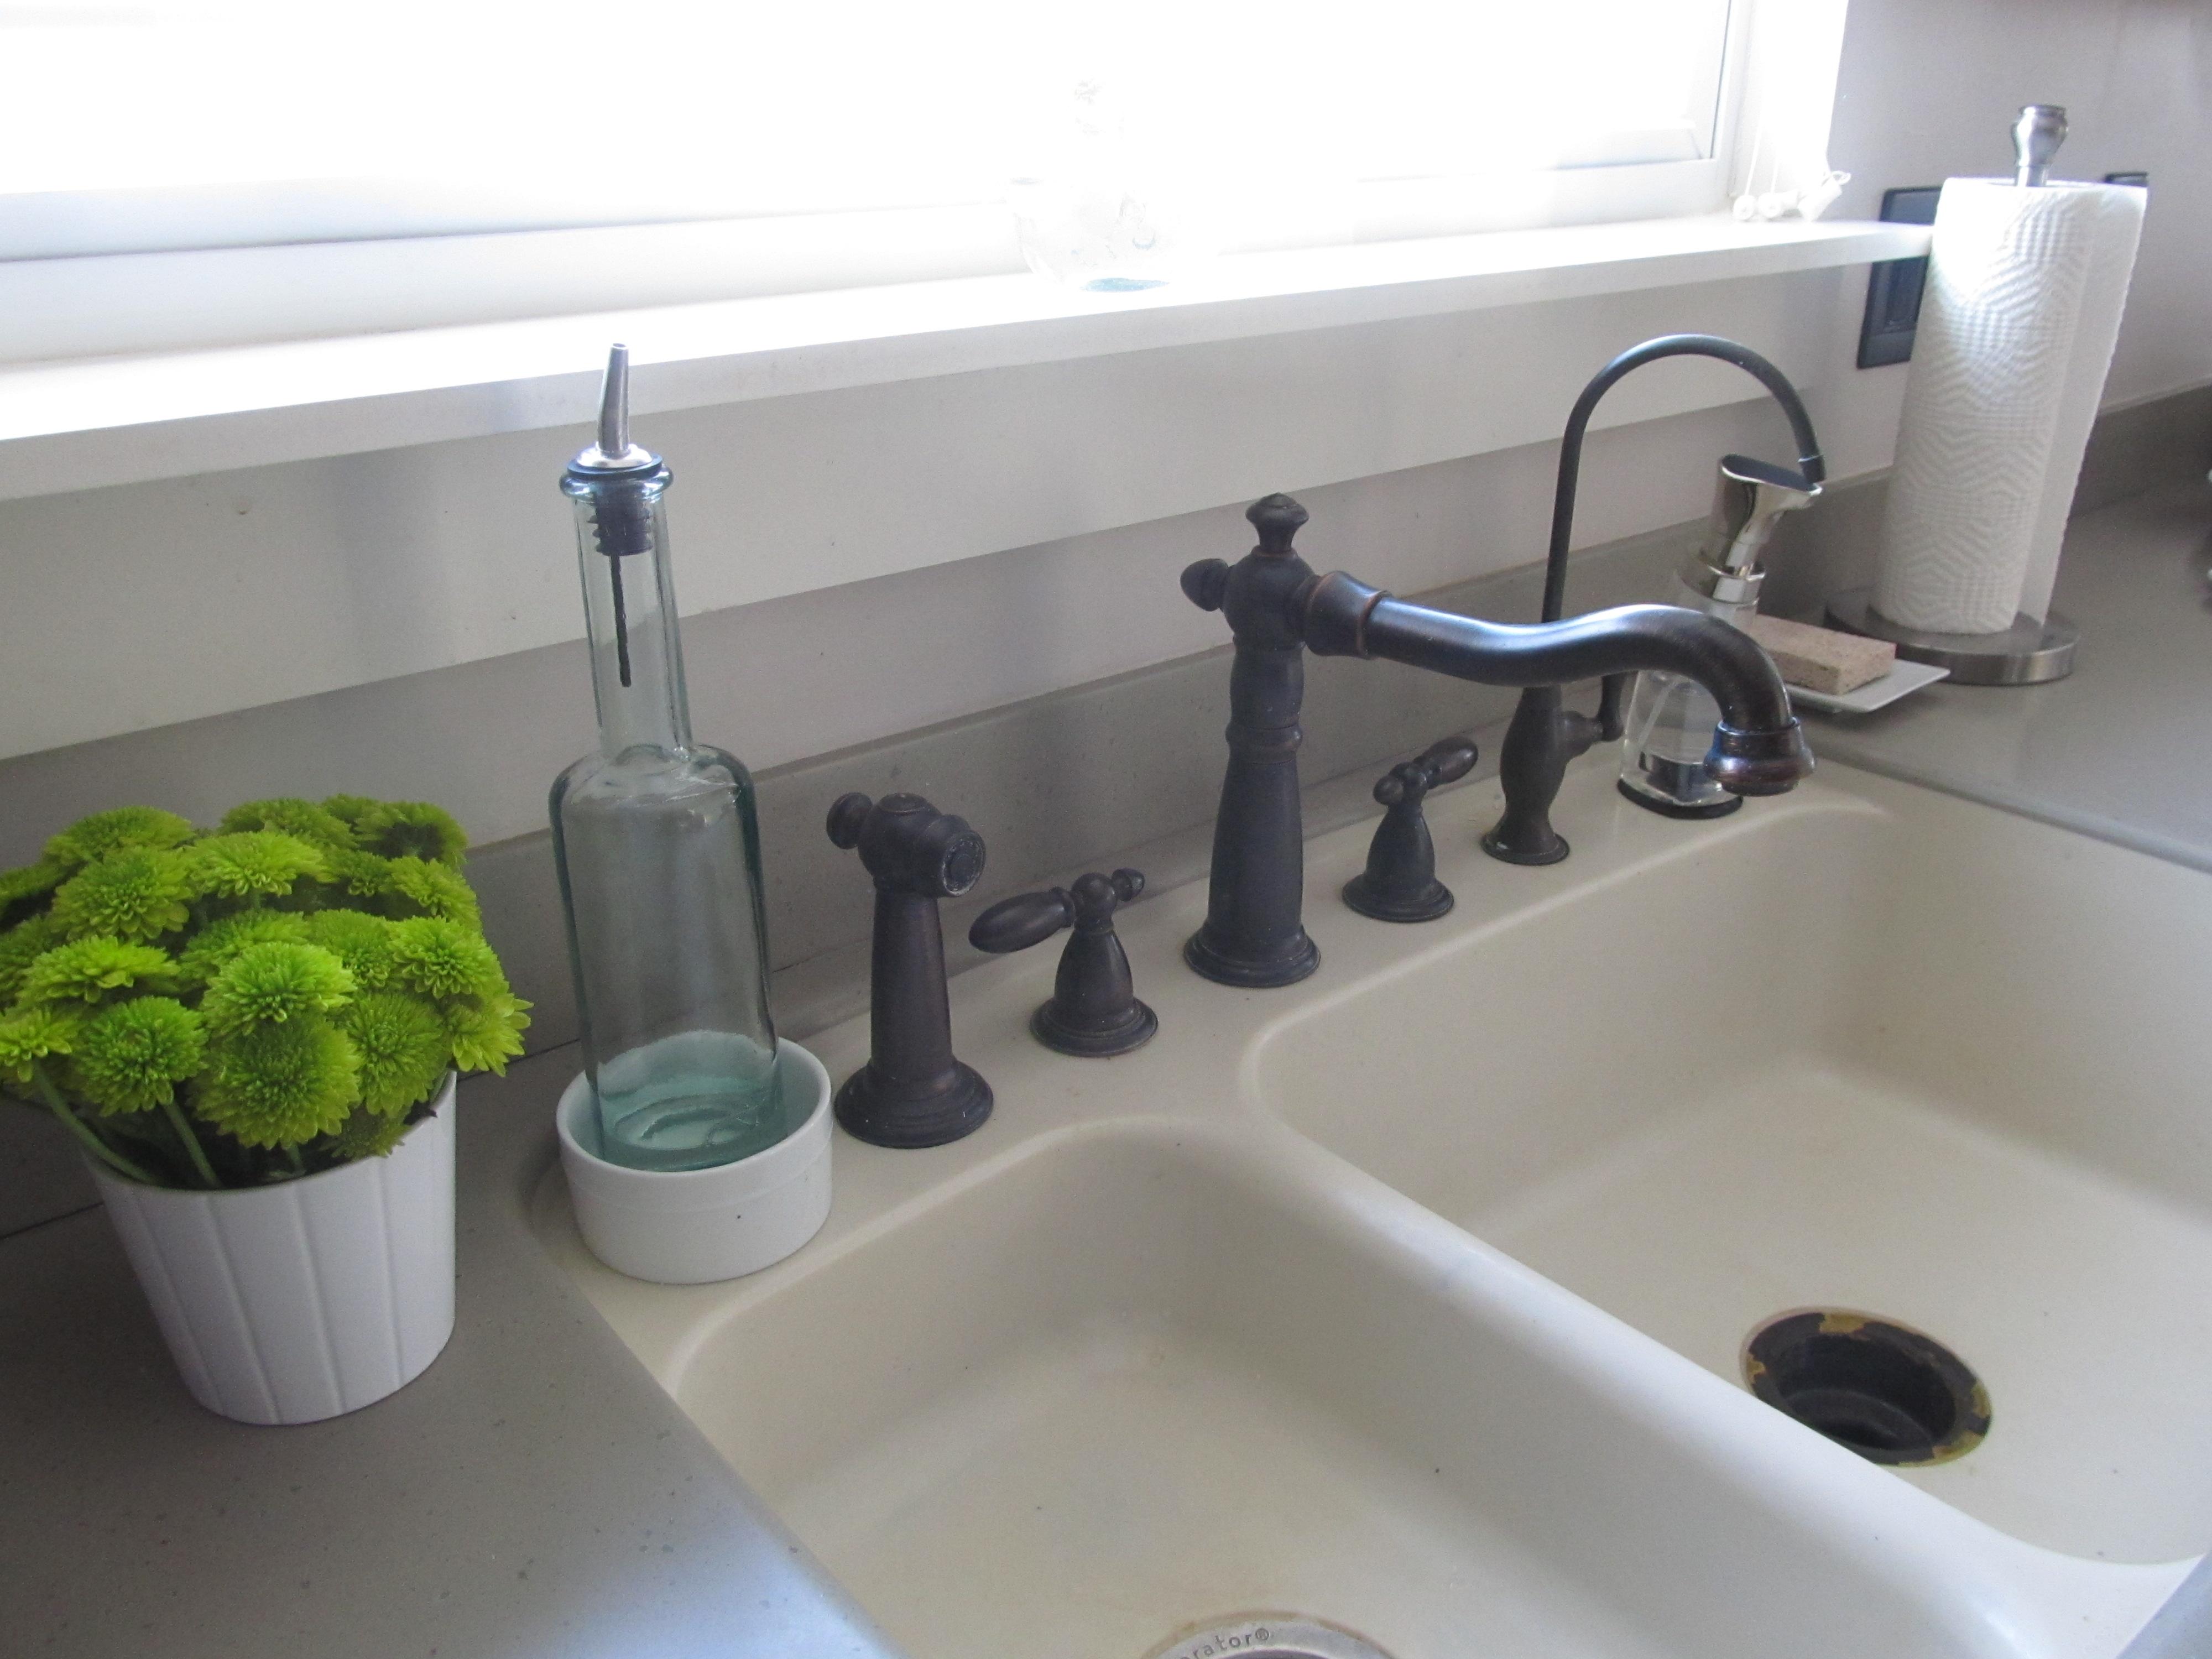 Ideas, custom kitchen sink faucets custom kitchen sink faucets kitchen sink area design home design ideas 4000 x 3000  .